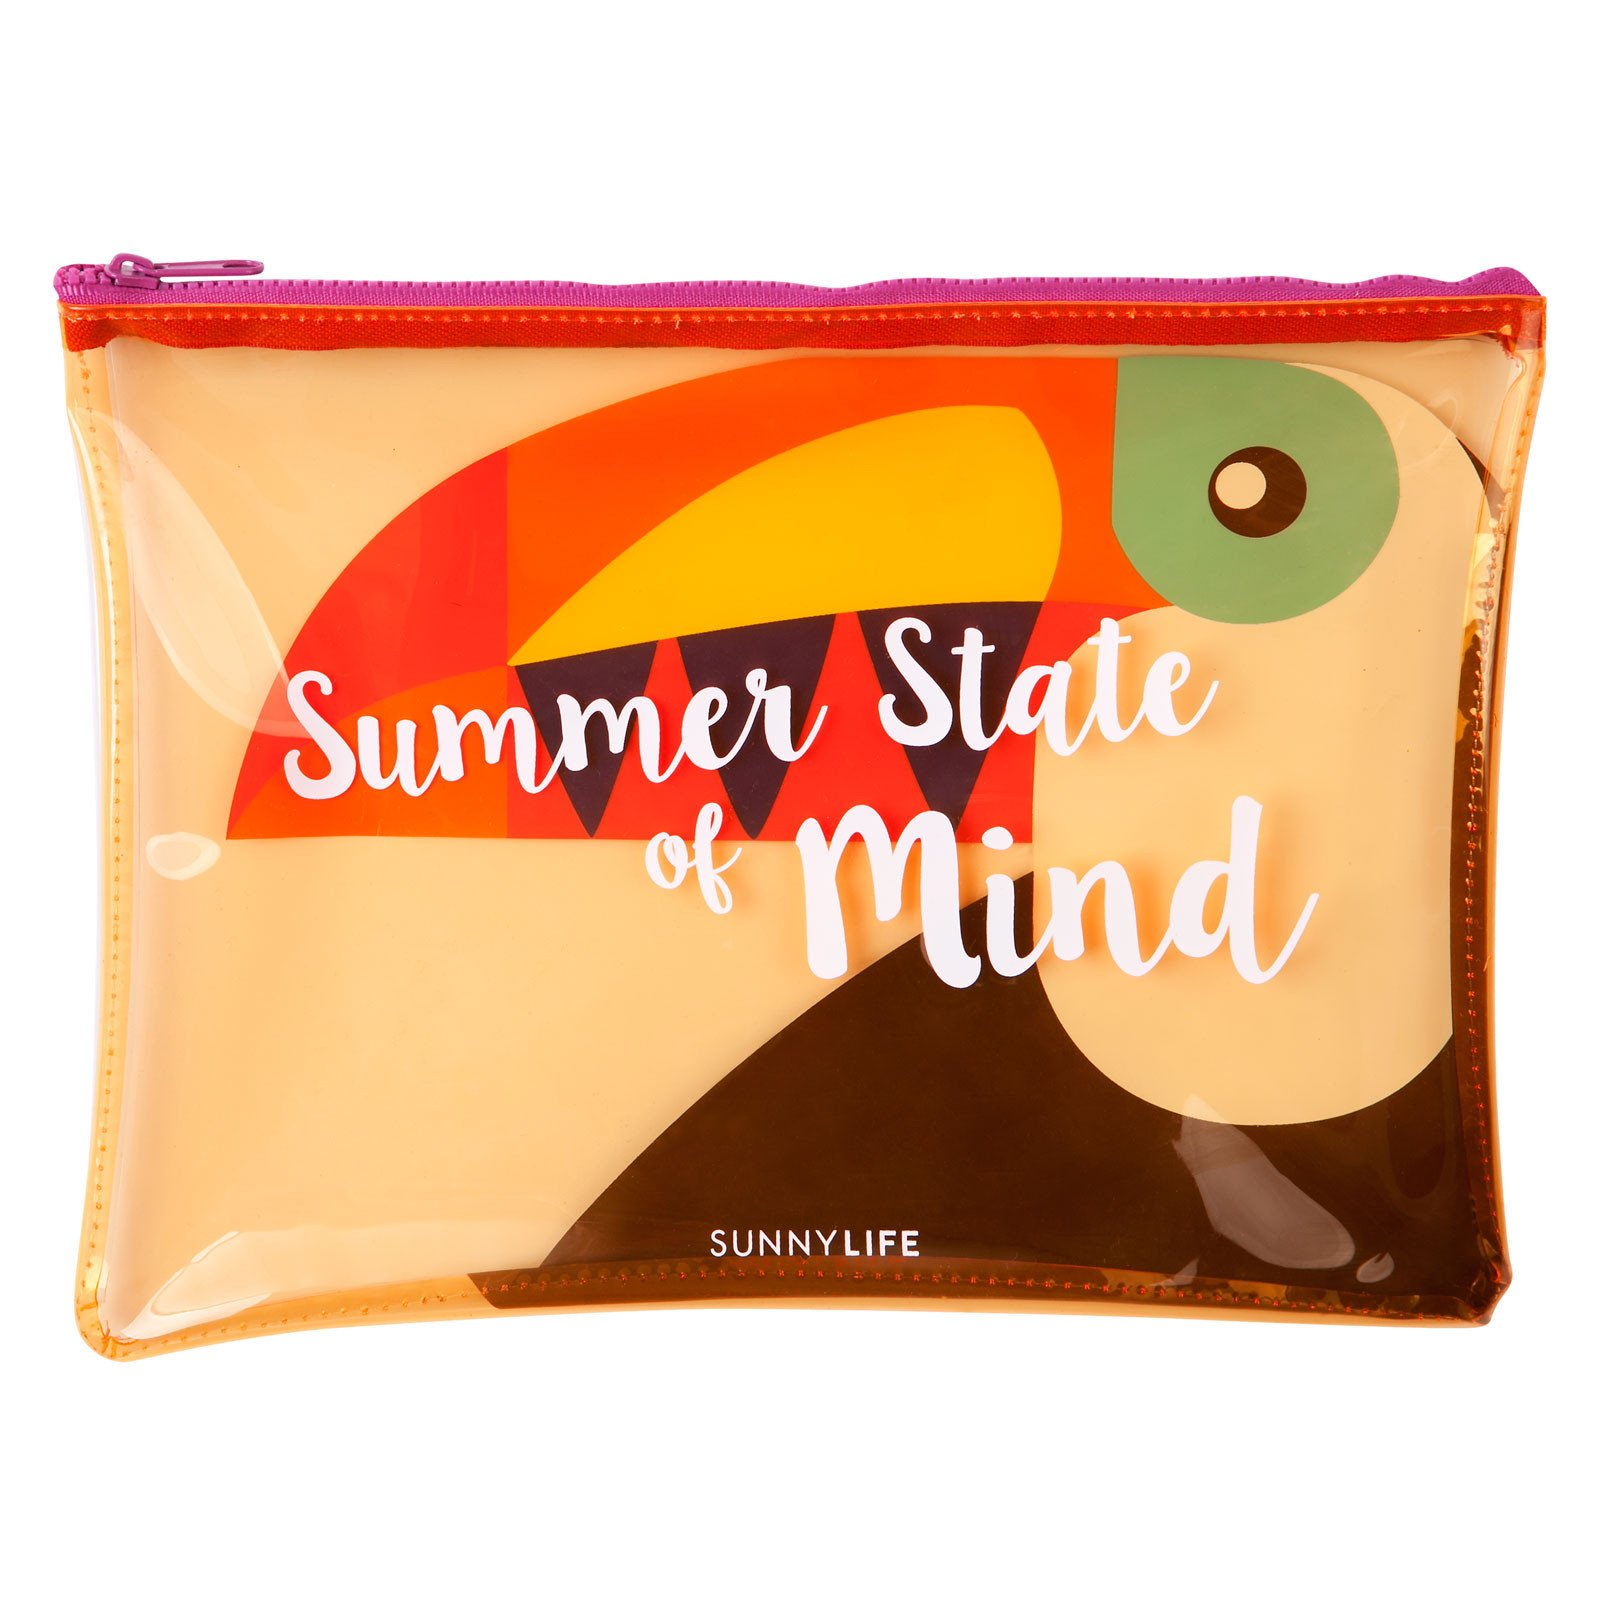 SunnyLIFE See Thru Beach Zipper Pouch Waterproof and Stylish Translucent Soft Plastic Handbag - Toucan